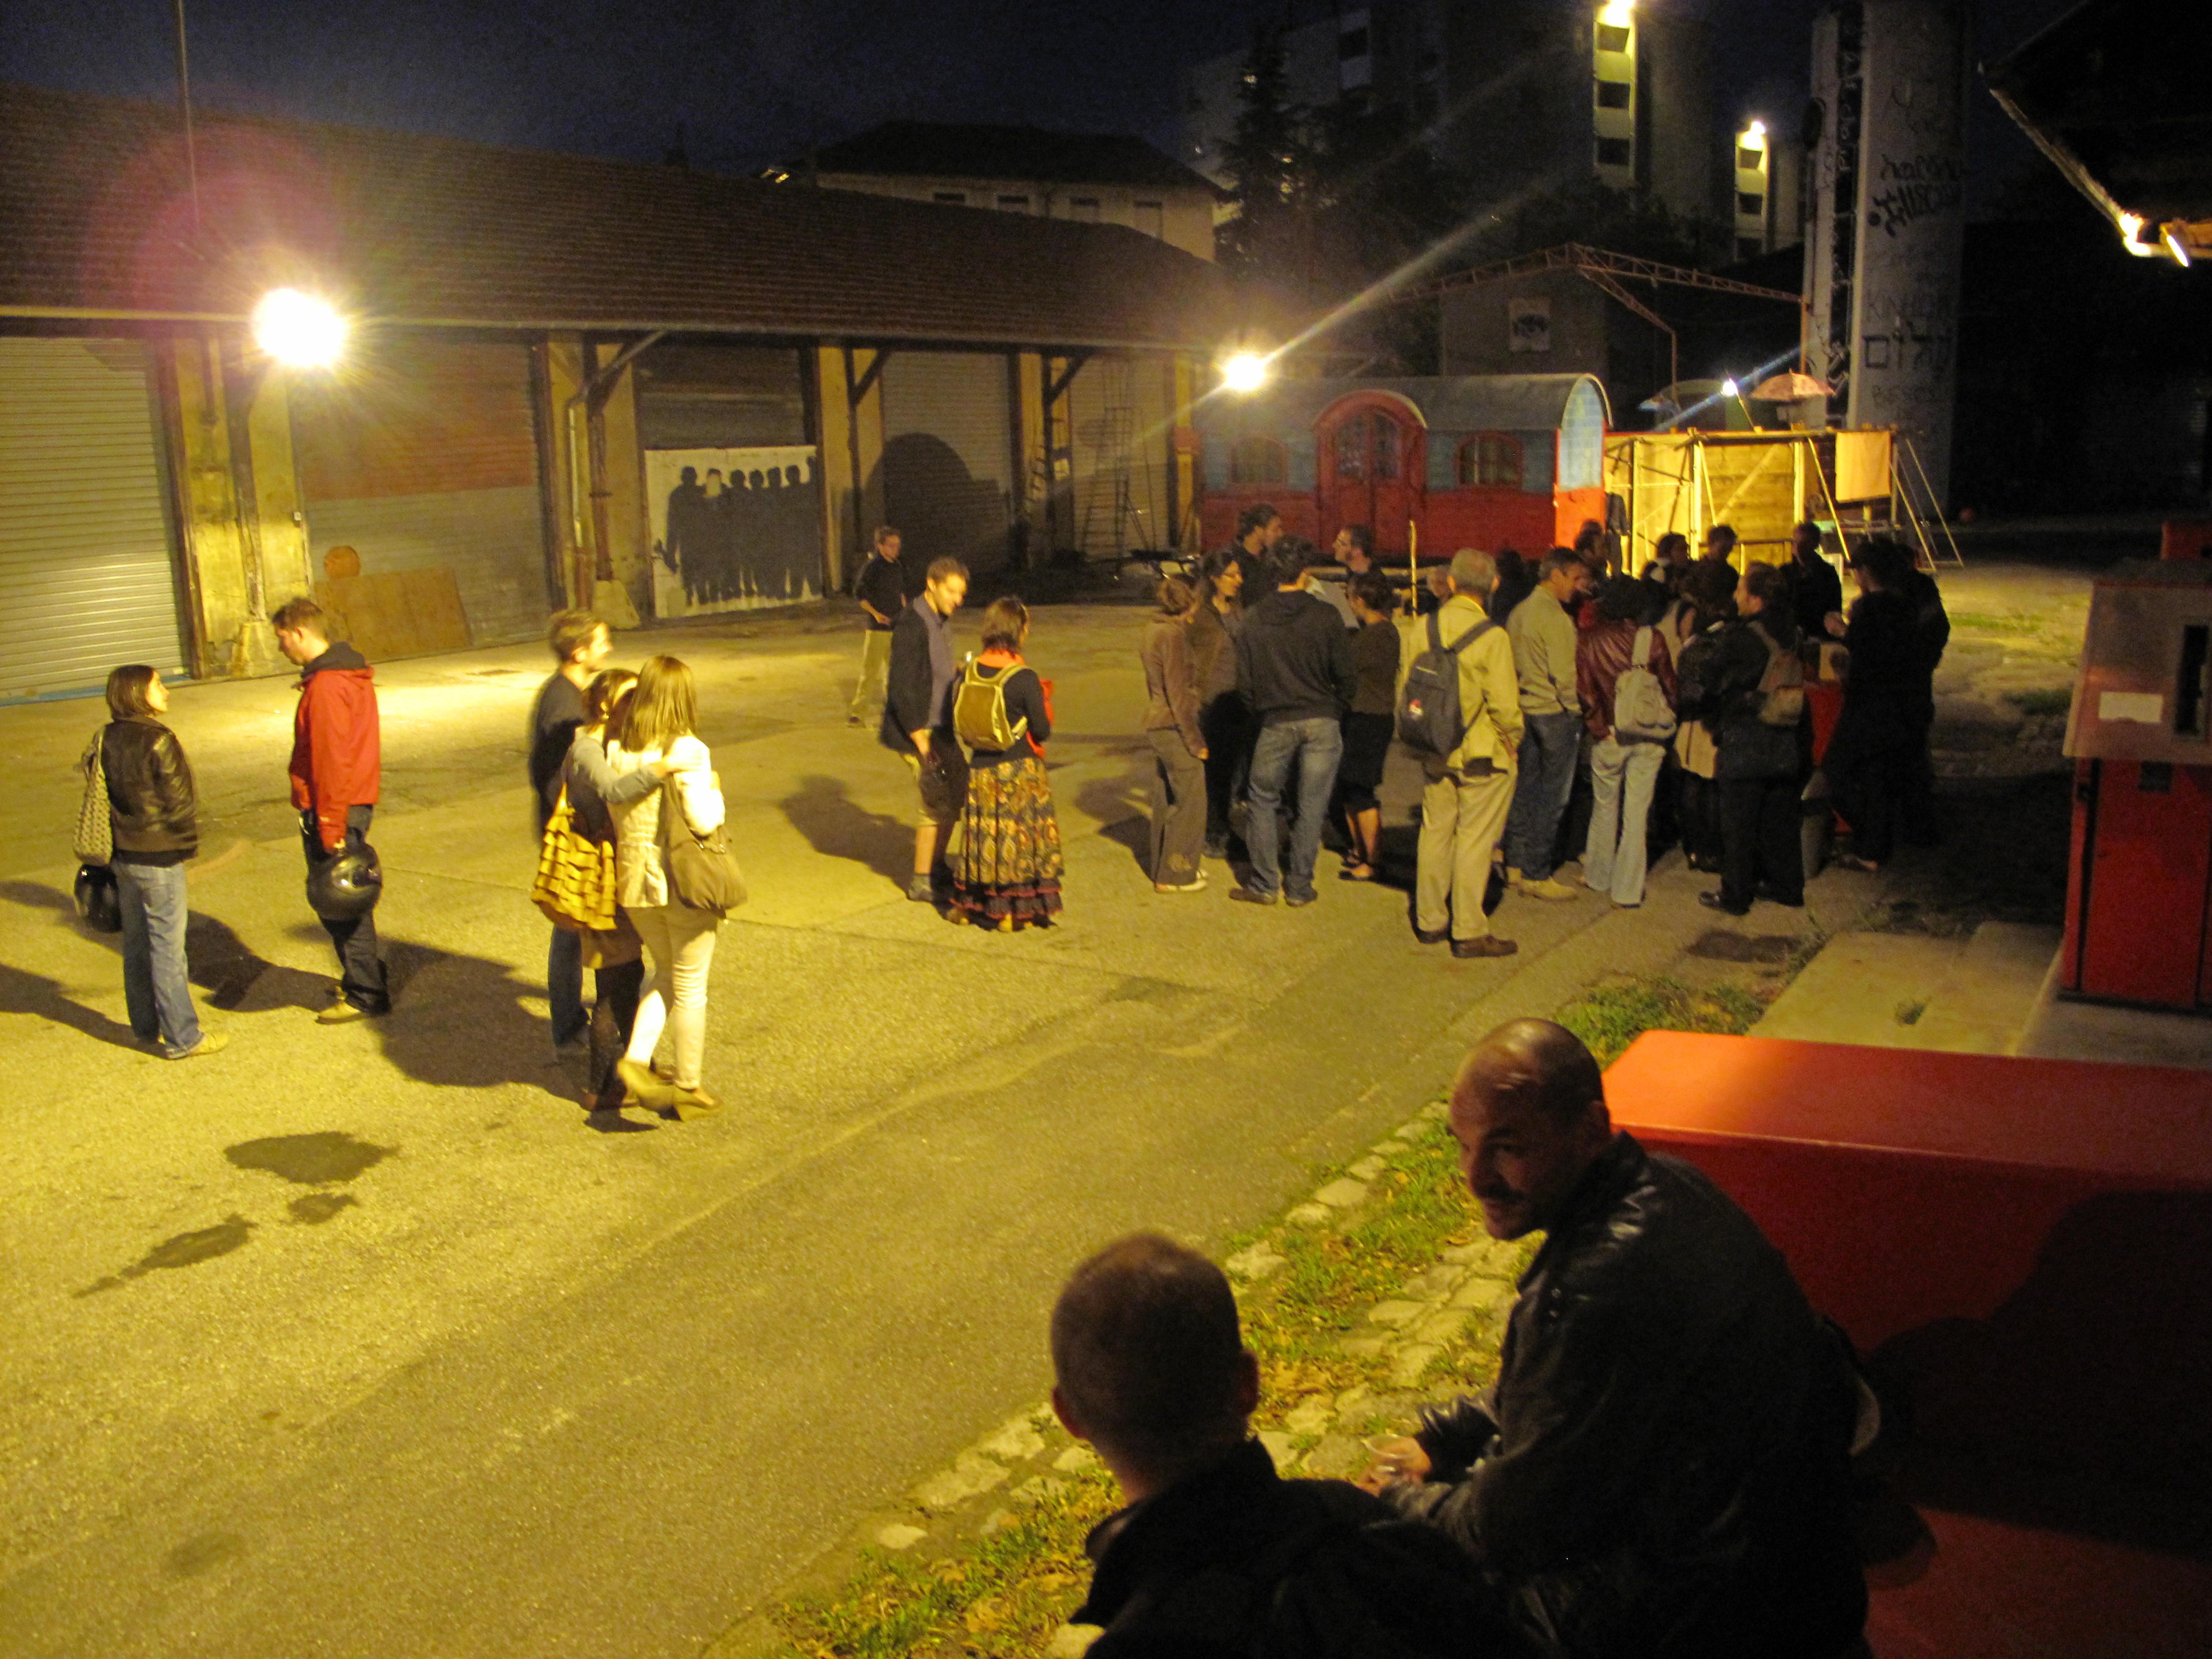 Compagnie Amaranta & Martin Petitguyot - Sortie d'atelier - 22 septembre 2011